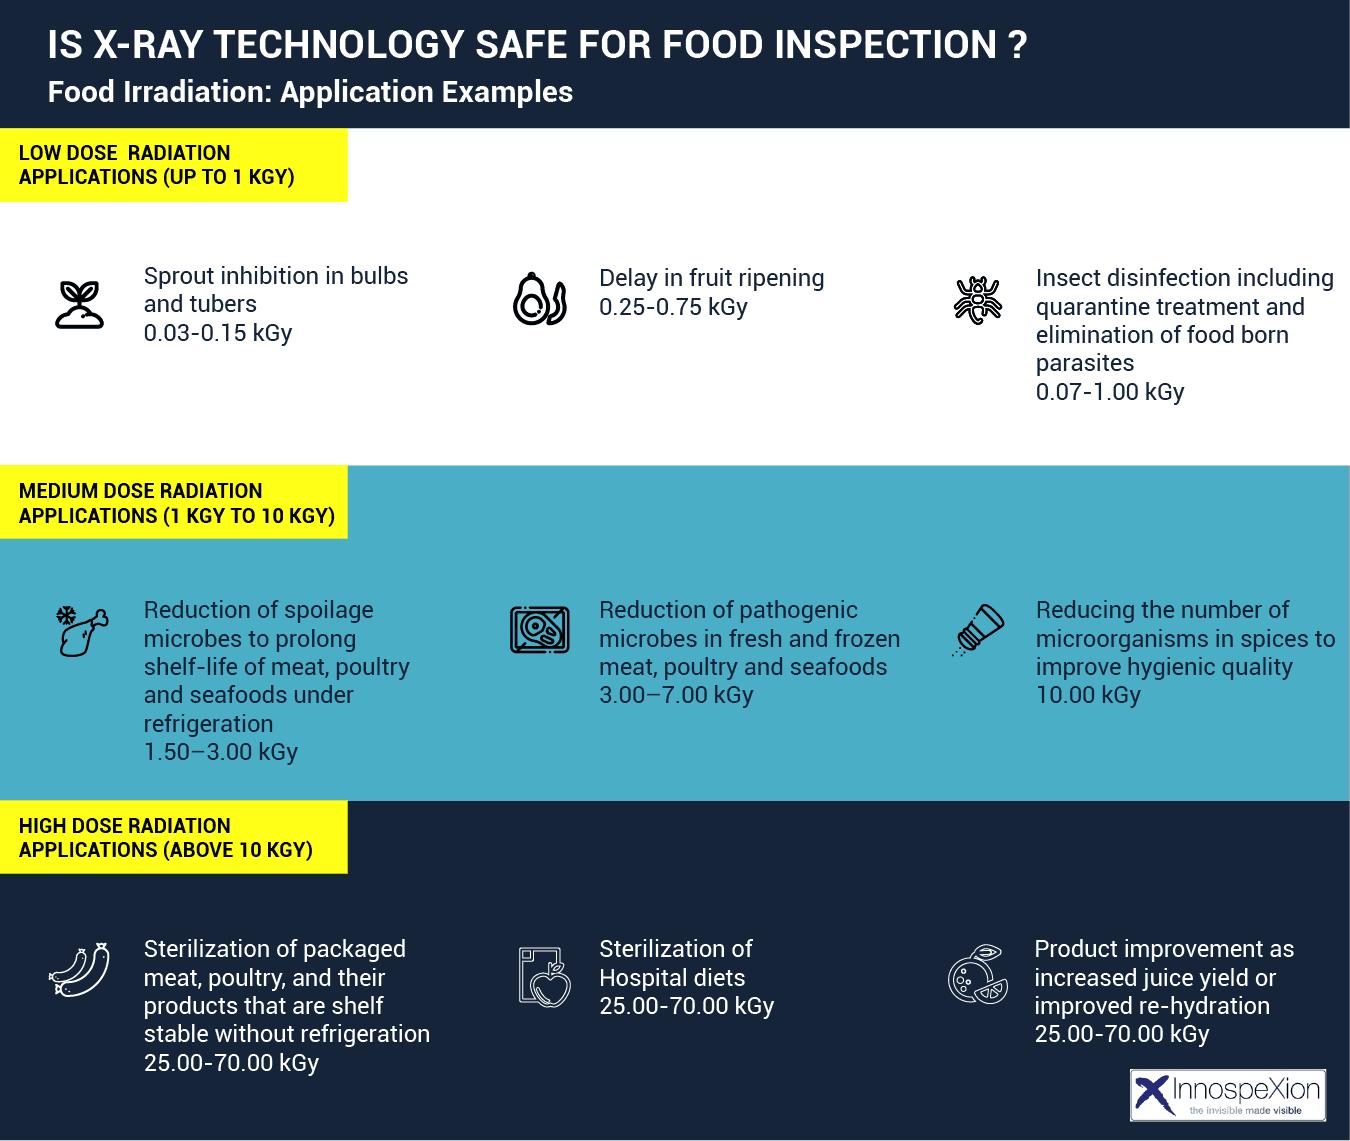 x-ray food irradiation